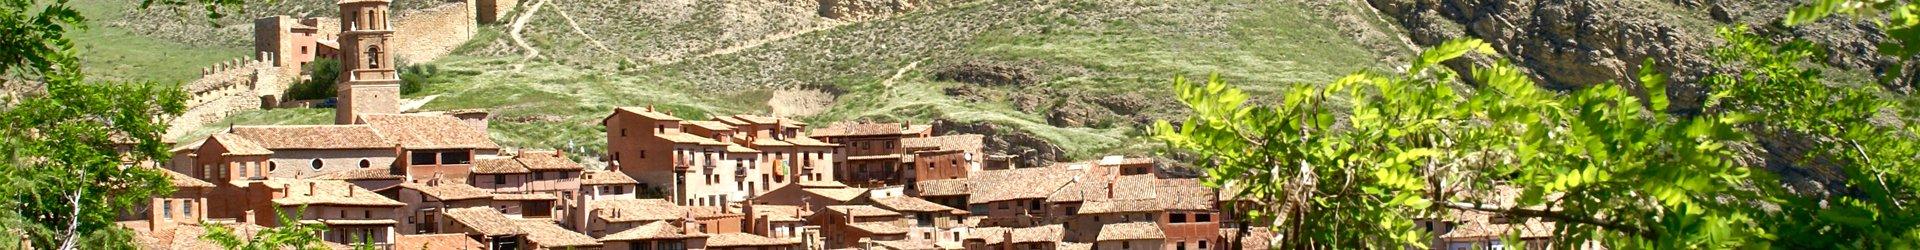 Reisverhaal Midden- en Oost-Spanje